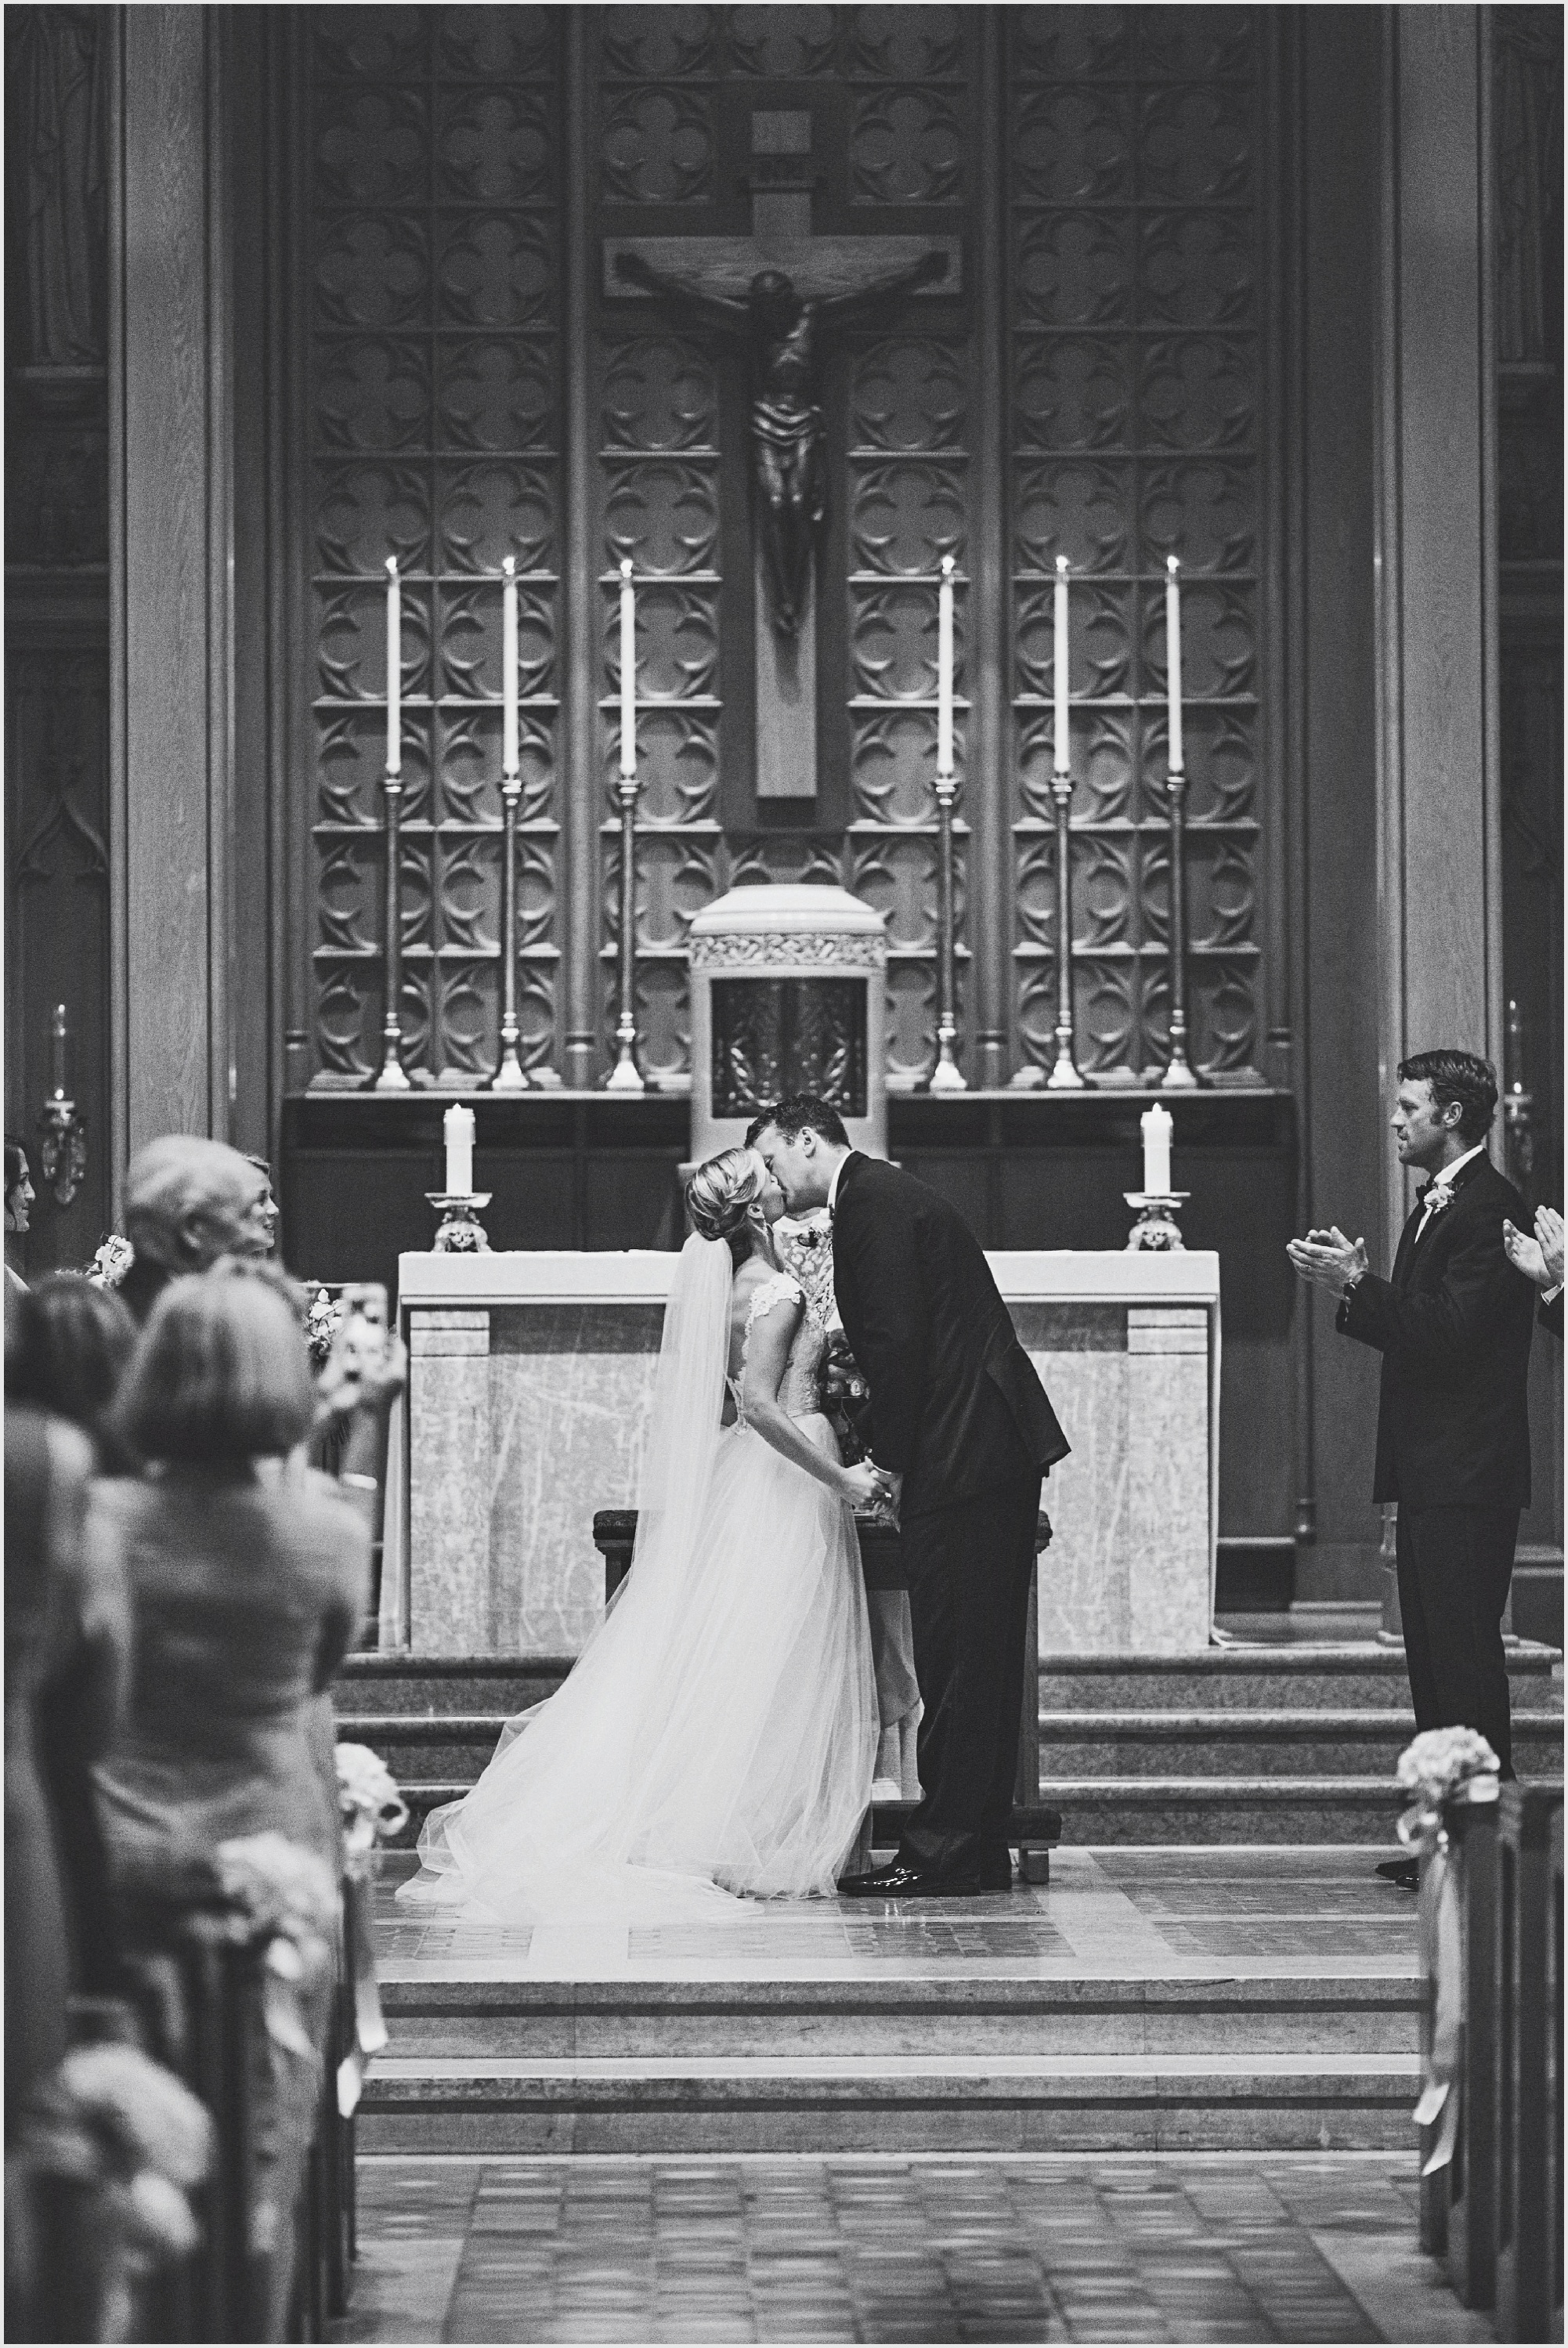 maura_david_james_j_hill_wedding_lucas_botz_photography_018.jpg